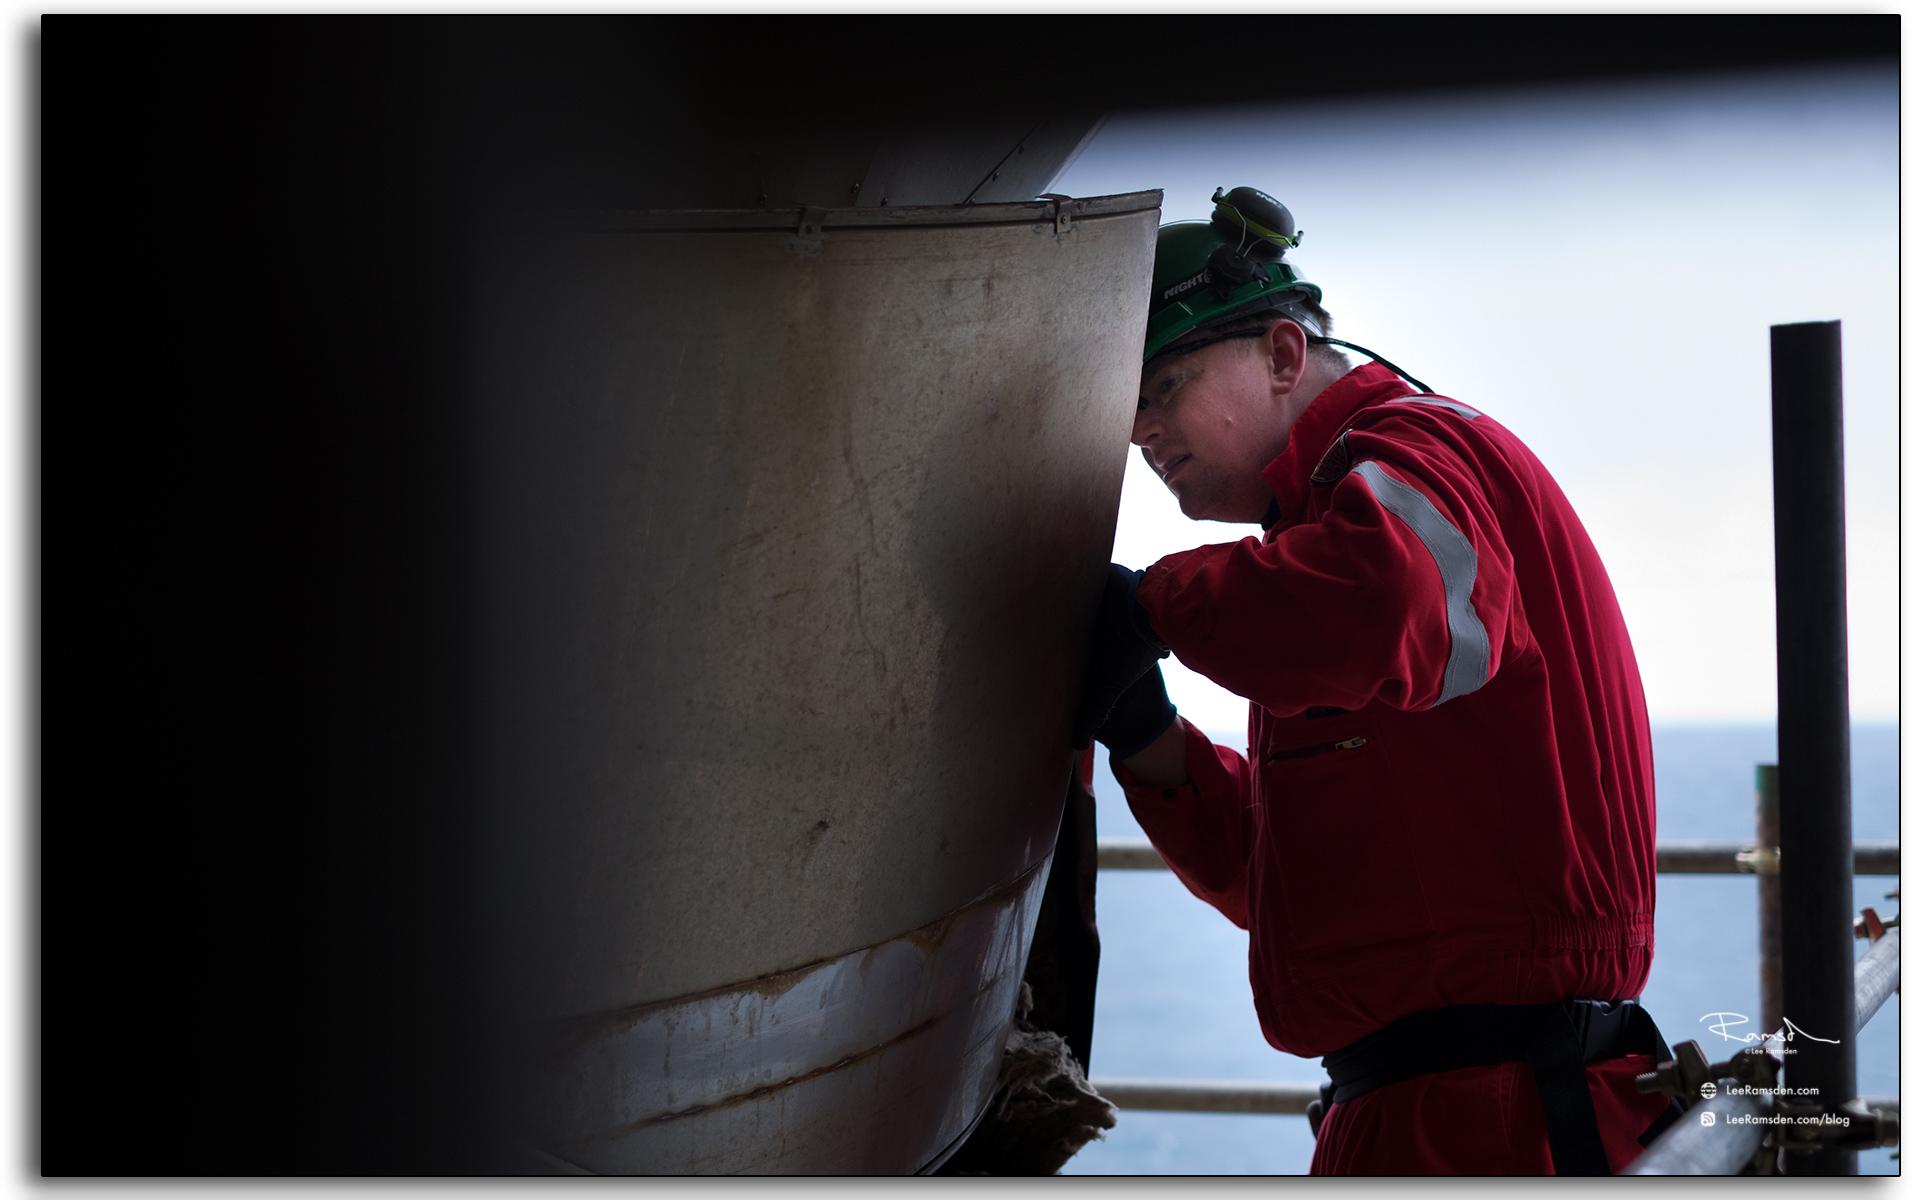 chris boyle, environmentalessentials.co.uk, asbestos specialist, survey, inspection, testing.